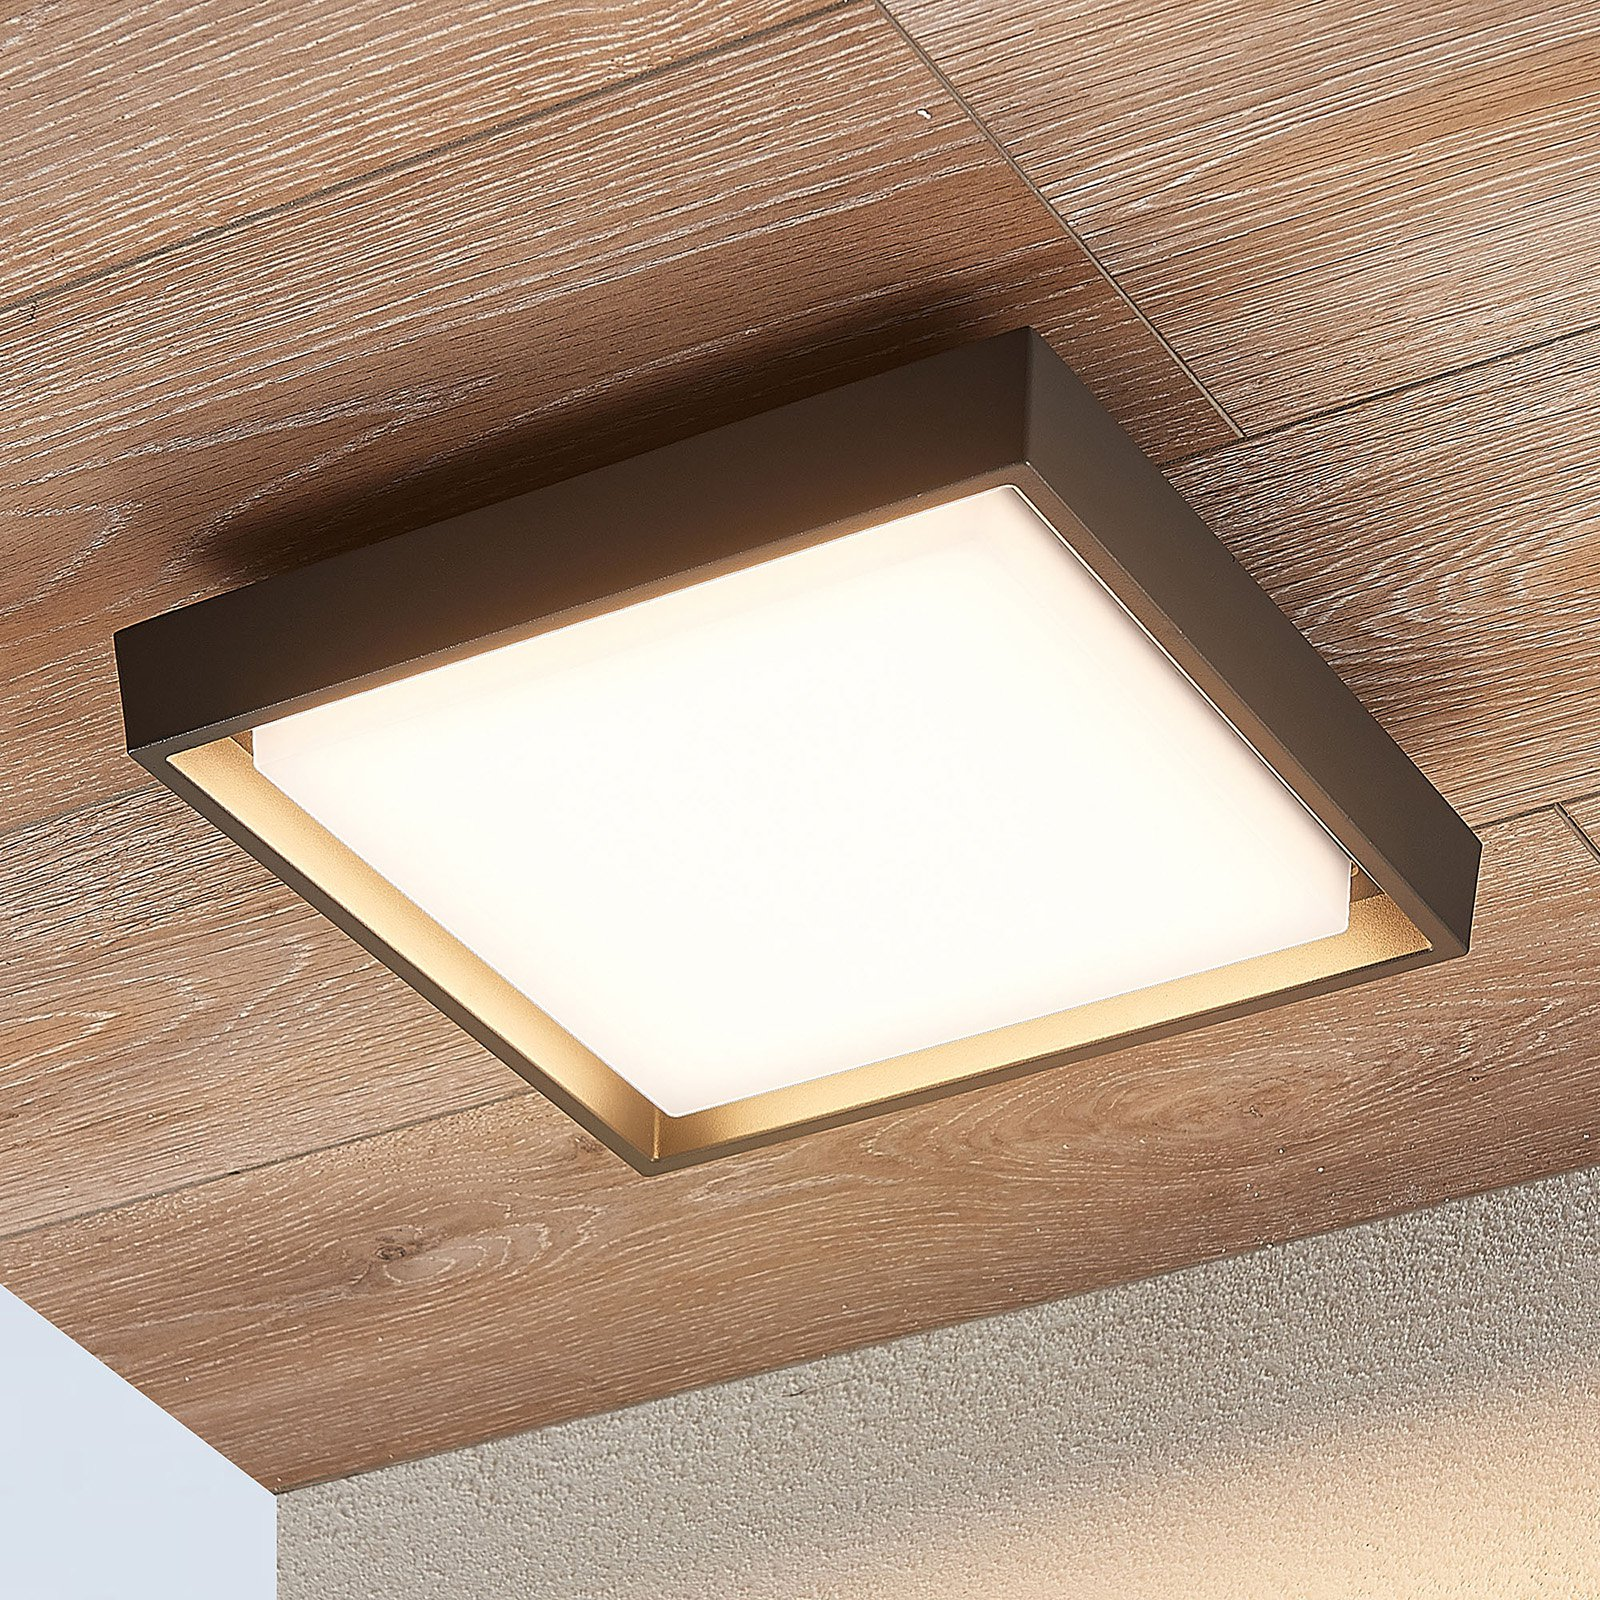 LED-utetaklampe Birta, kantet, 27 cm